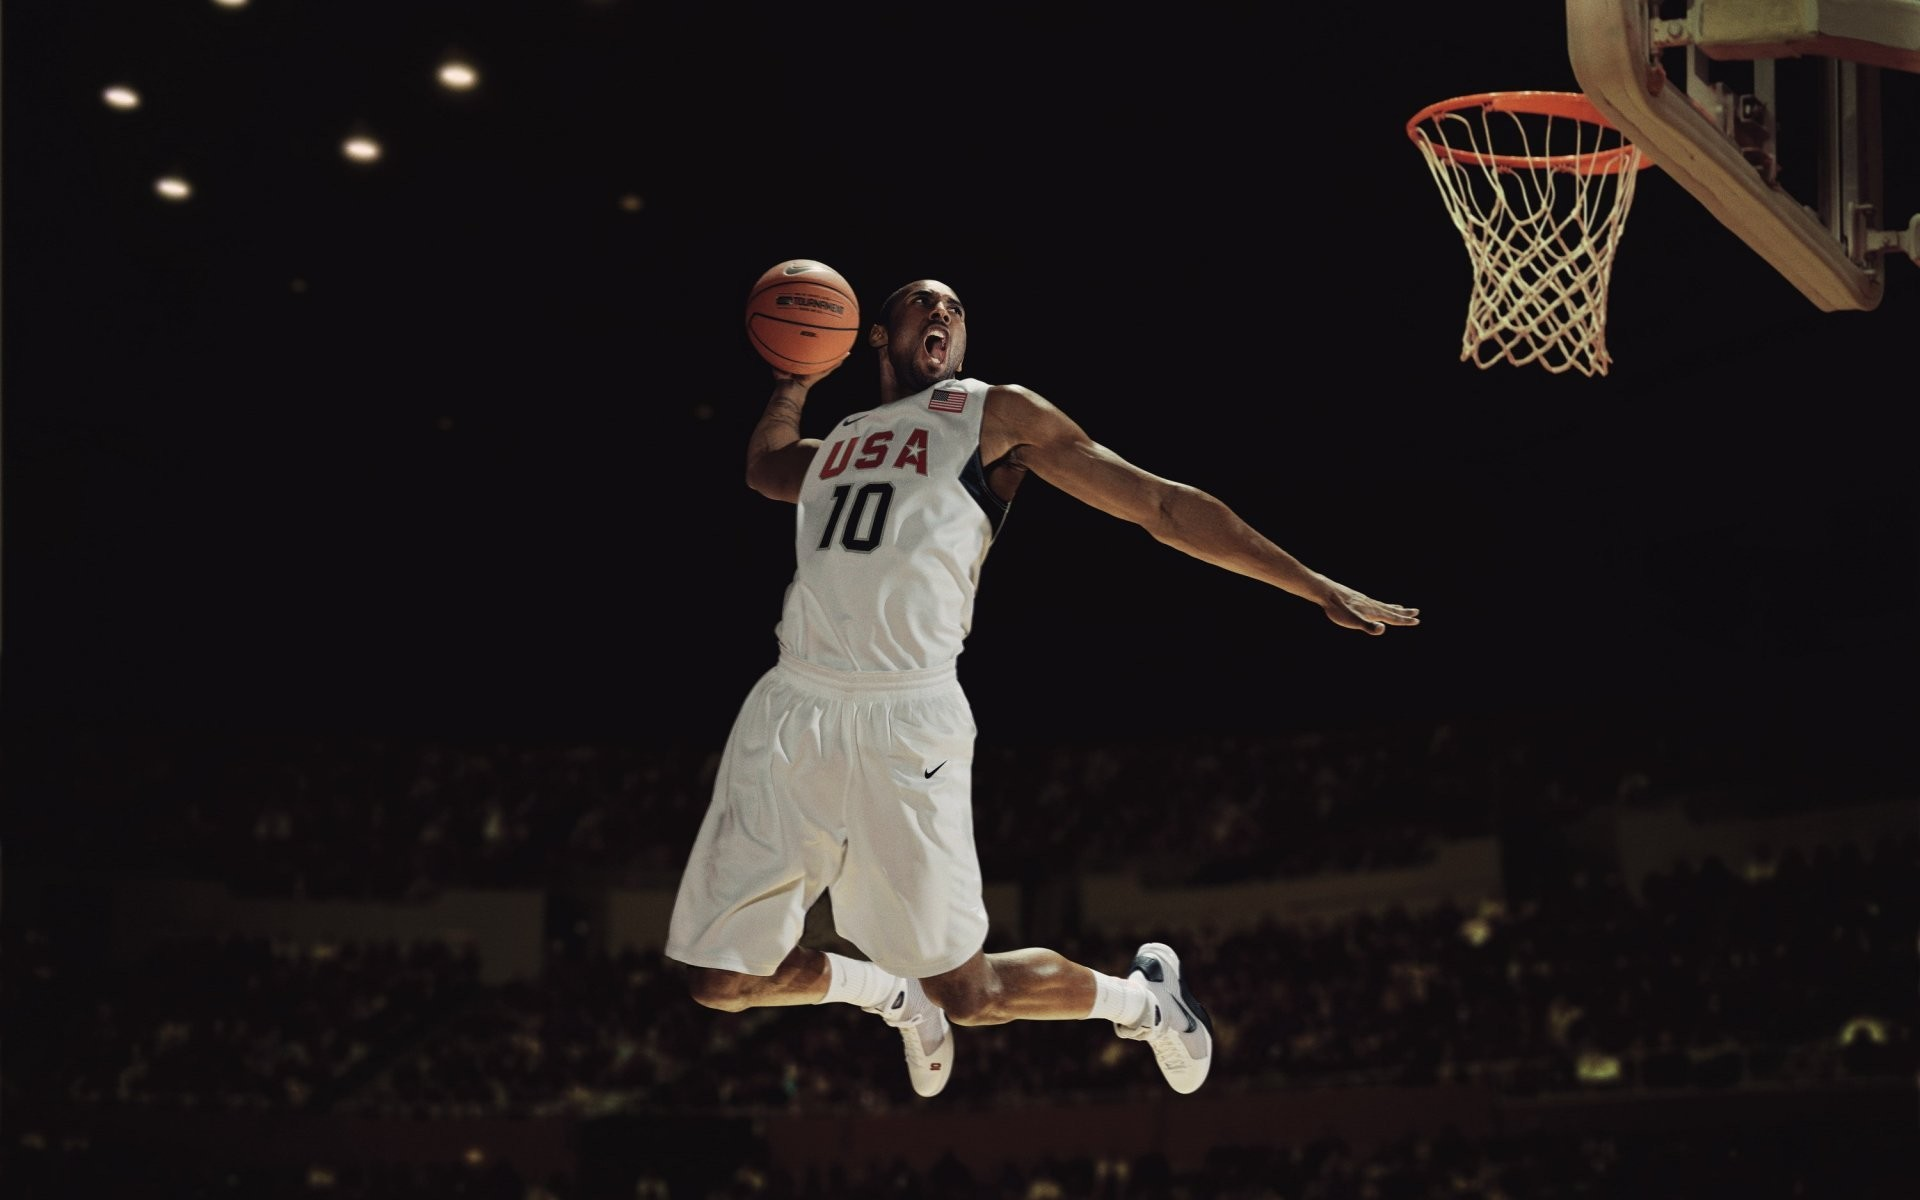 kobe bryant player basketball usa team hang slam dunk nike